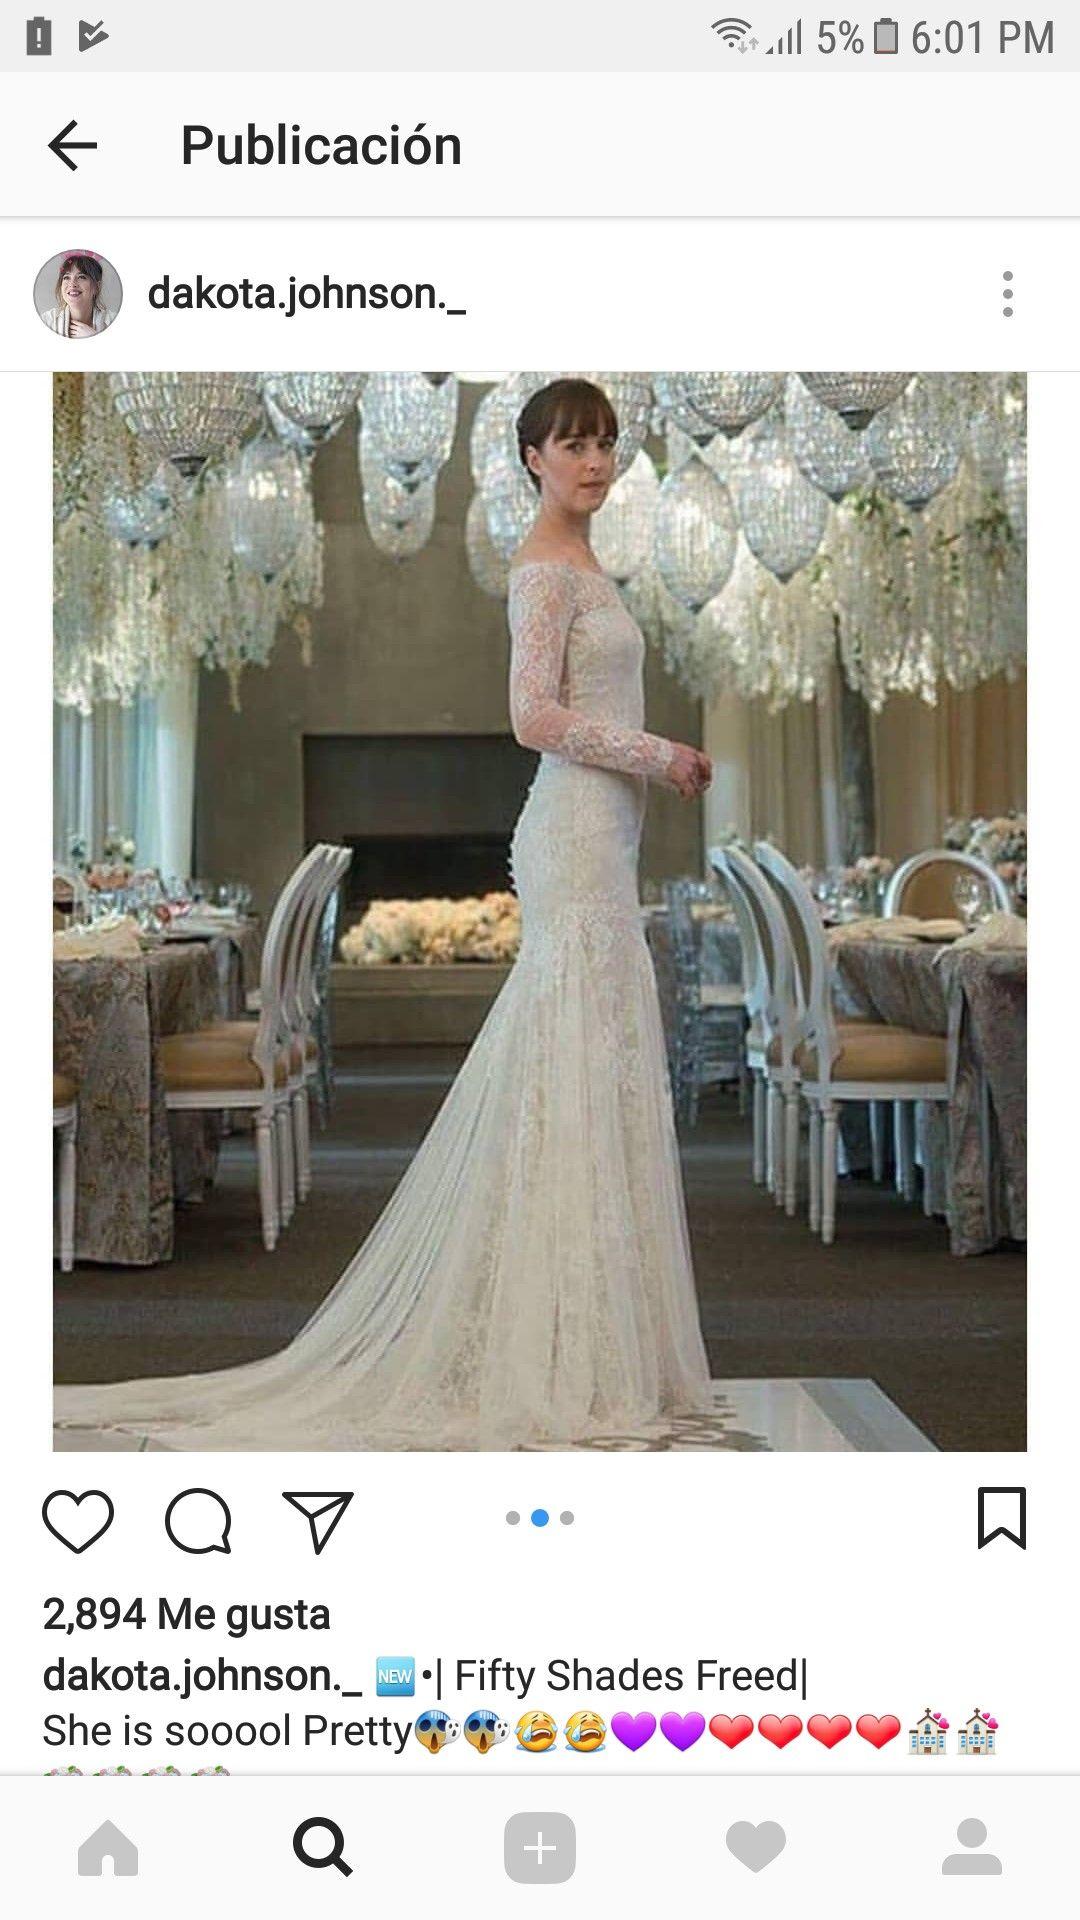 Pin De Ane Walker Em Meu Casamento Vestidos De Casamento Cinza